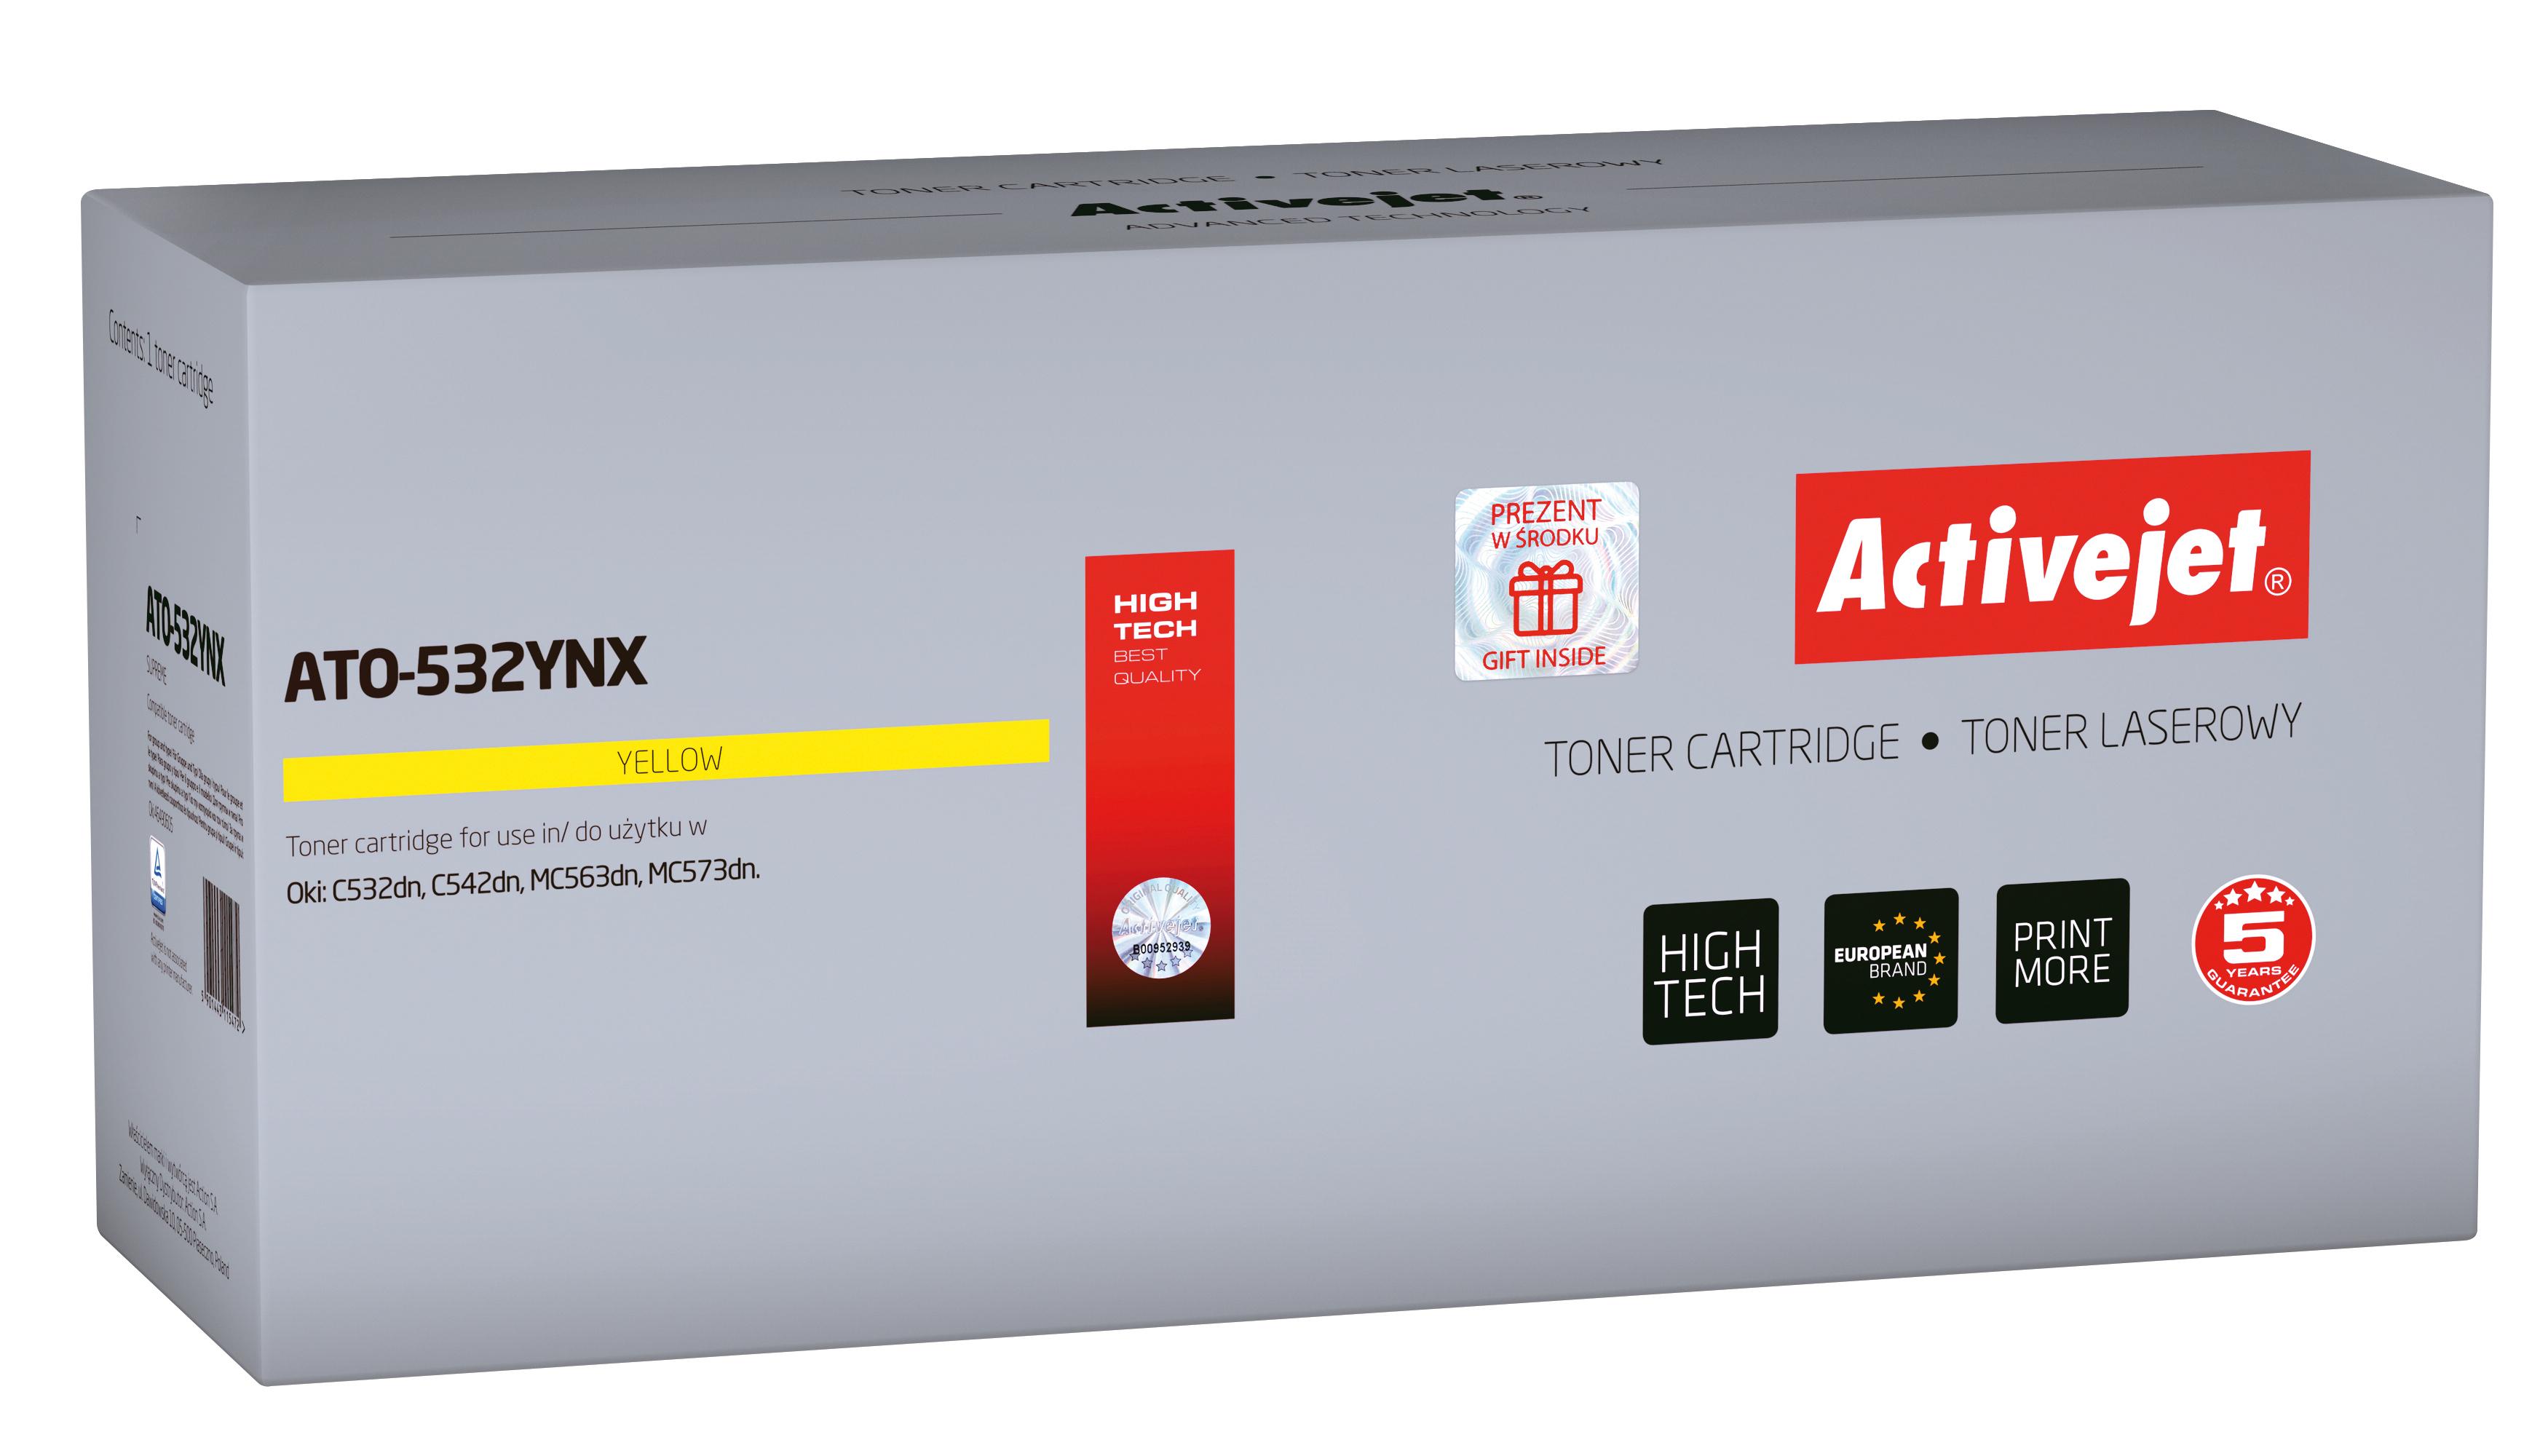 Toner Activejet  ATO-532YNX do drukarki OKI, Zamiennik OKI 46490605; Supreme; 6000 stron; Żólty.